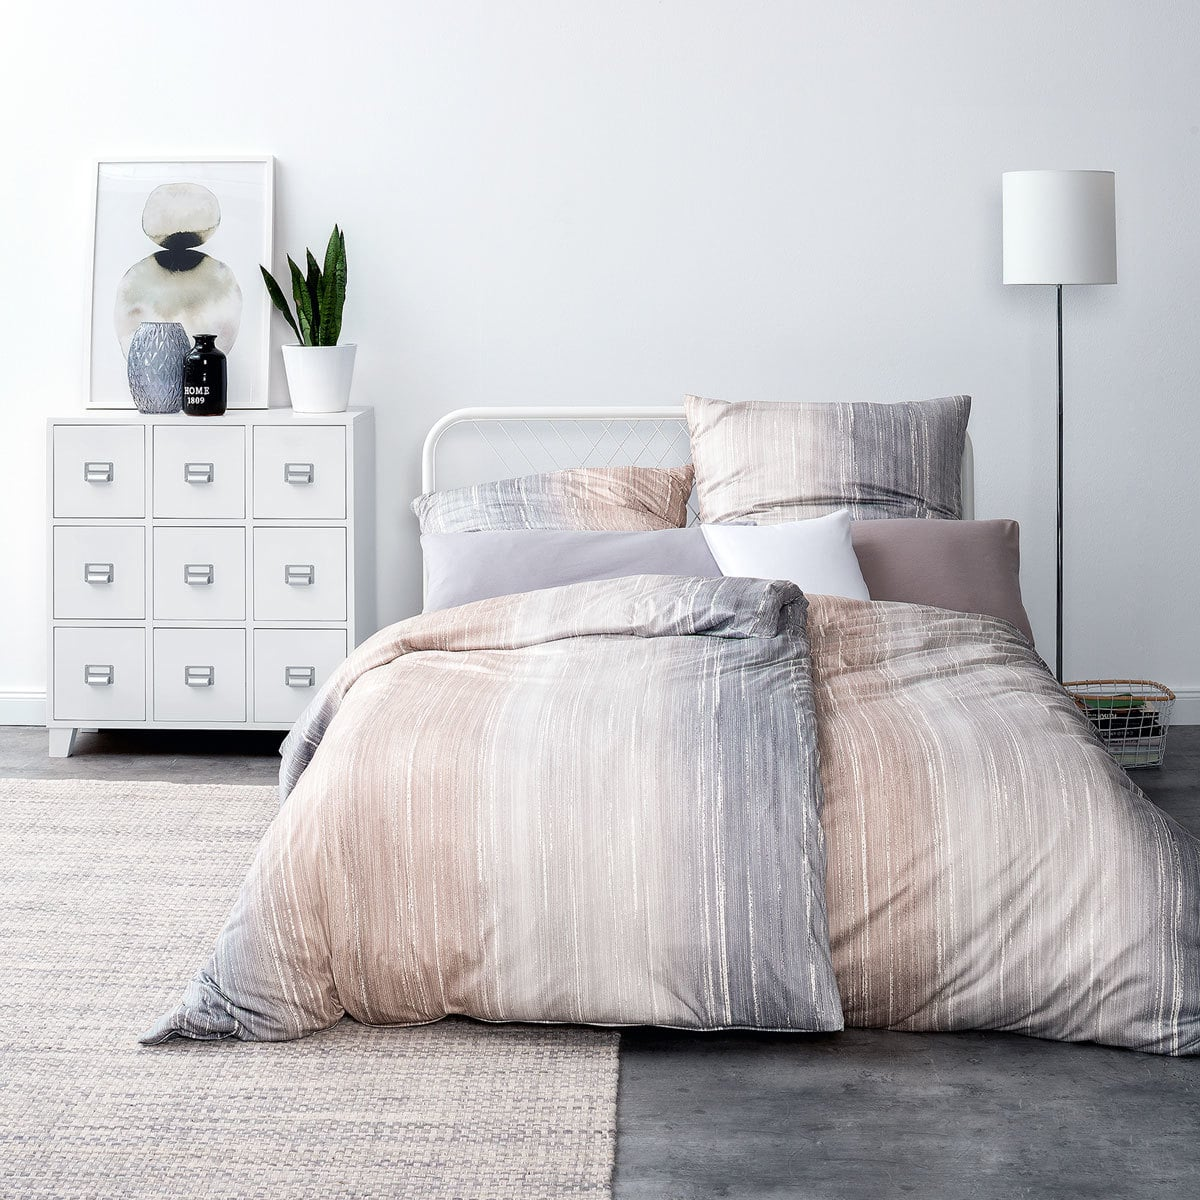 estella mako interlock jersey bettw sche kilian kiesel. Black Bedroom Furniture Sets. Home Design Ideas